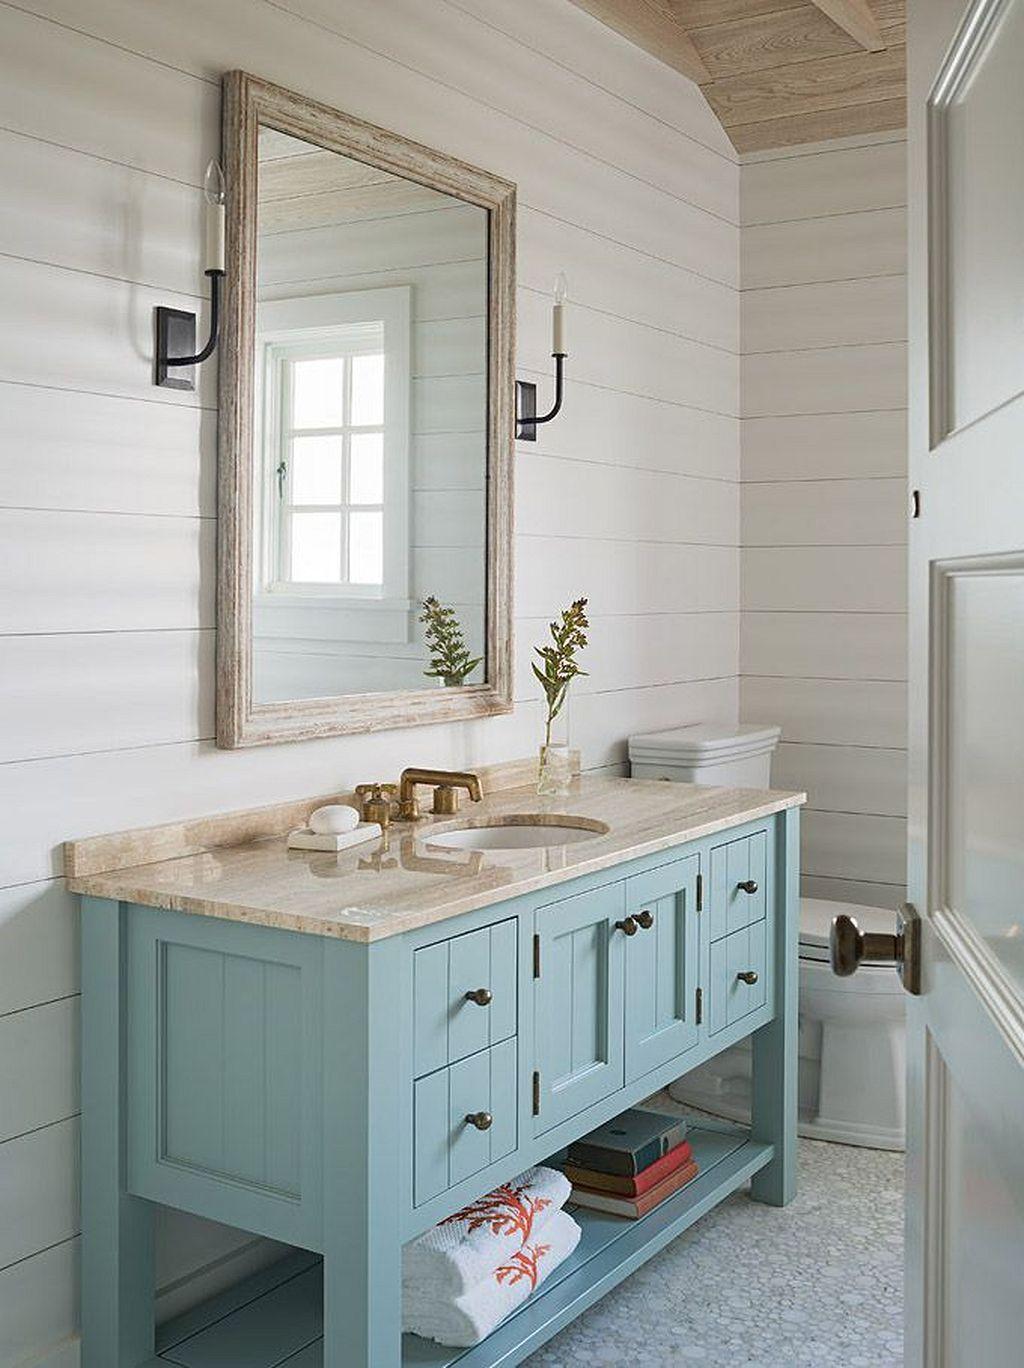 Awesome 50 Perfect Beach Themed Bathroom Ideas Https Hgmagz Com 50 Perfect Beach Themed Bathroom Beach House Bathroom Beach Bathroom Decor Bathrooms Remodel